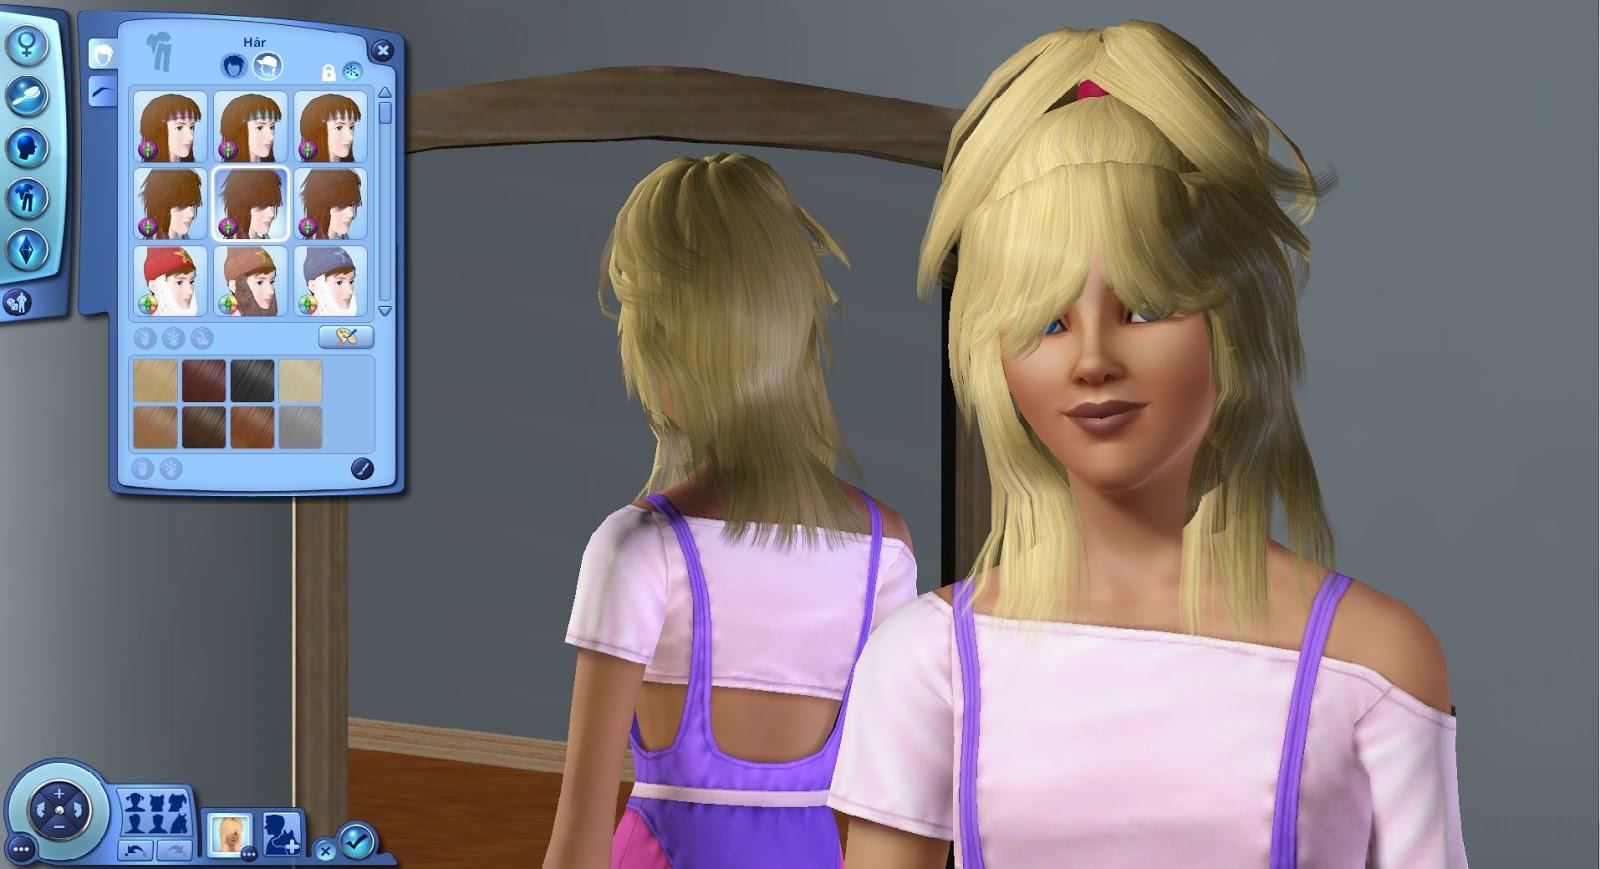 SimsTias - En Simsblogg/nyhetsajt: SimsTias Recenserar - The Sims ...